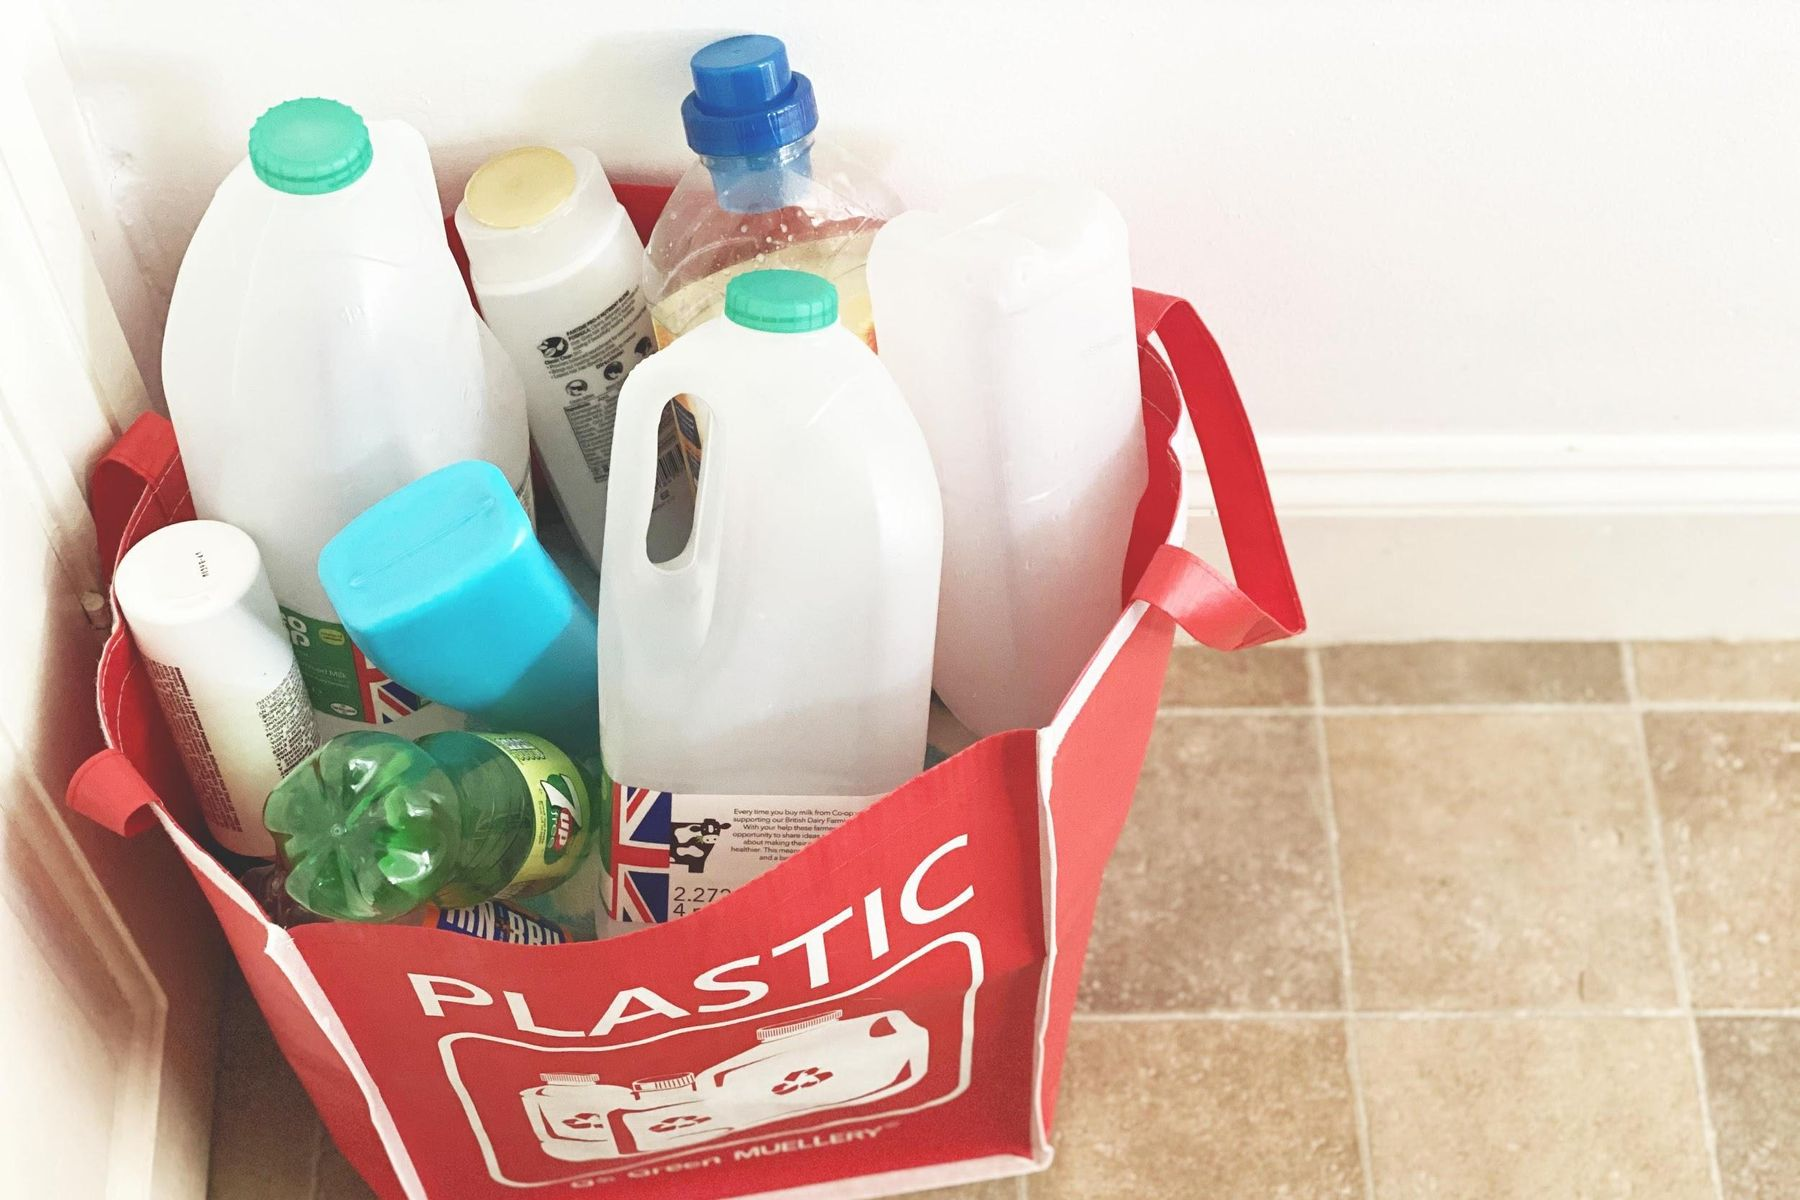 saco contendo garrafas de plástico para serem recicladas